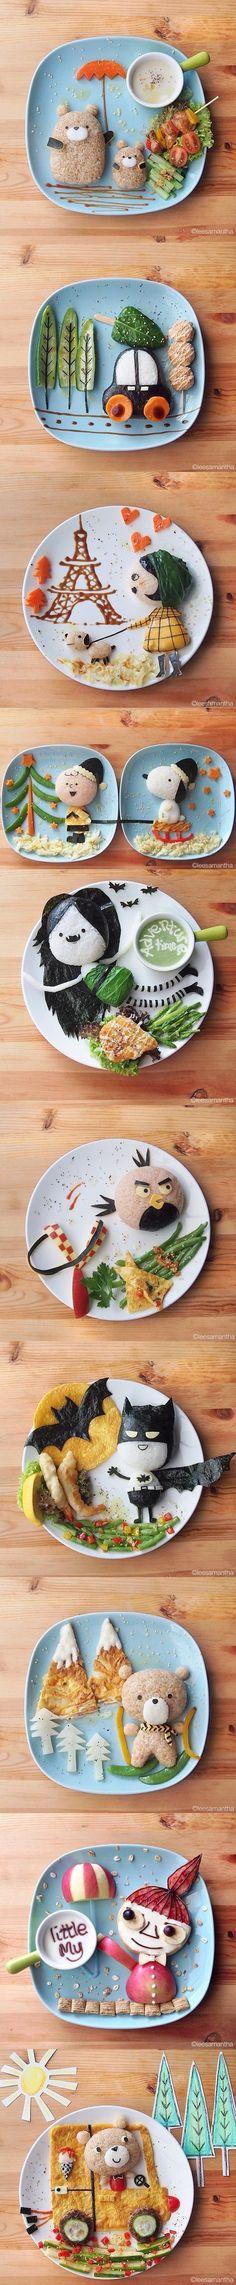 Amazing Food Art By Samantha Lee - Still Cracking